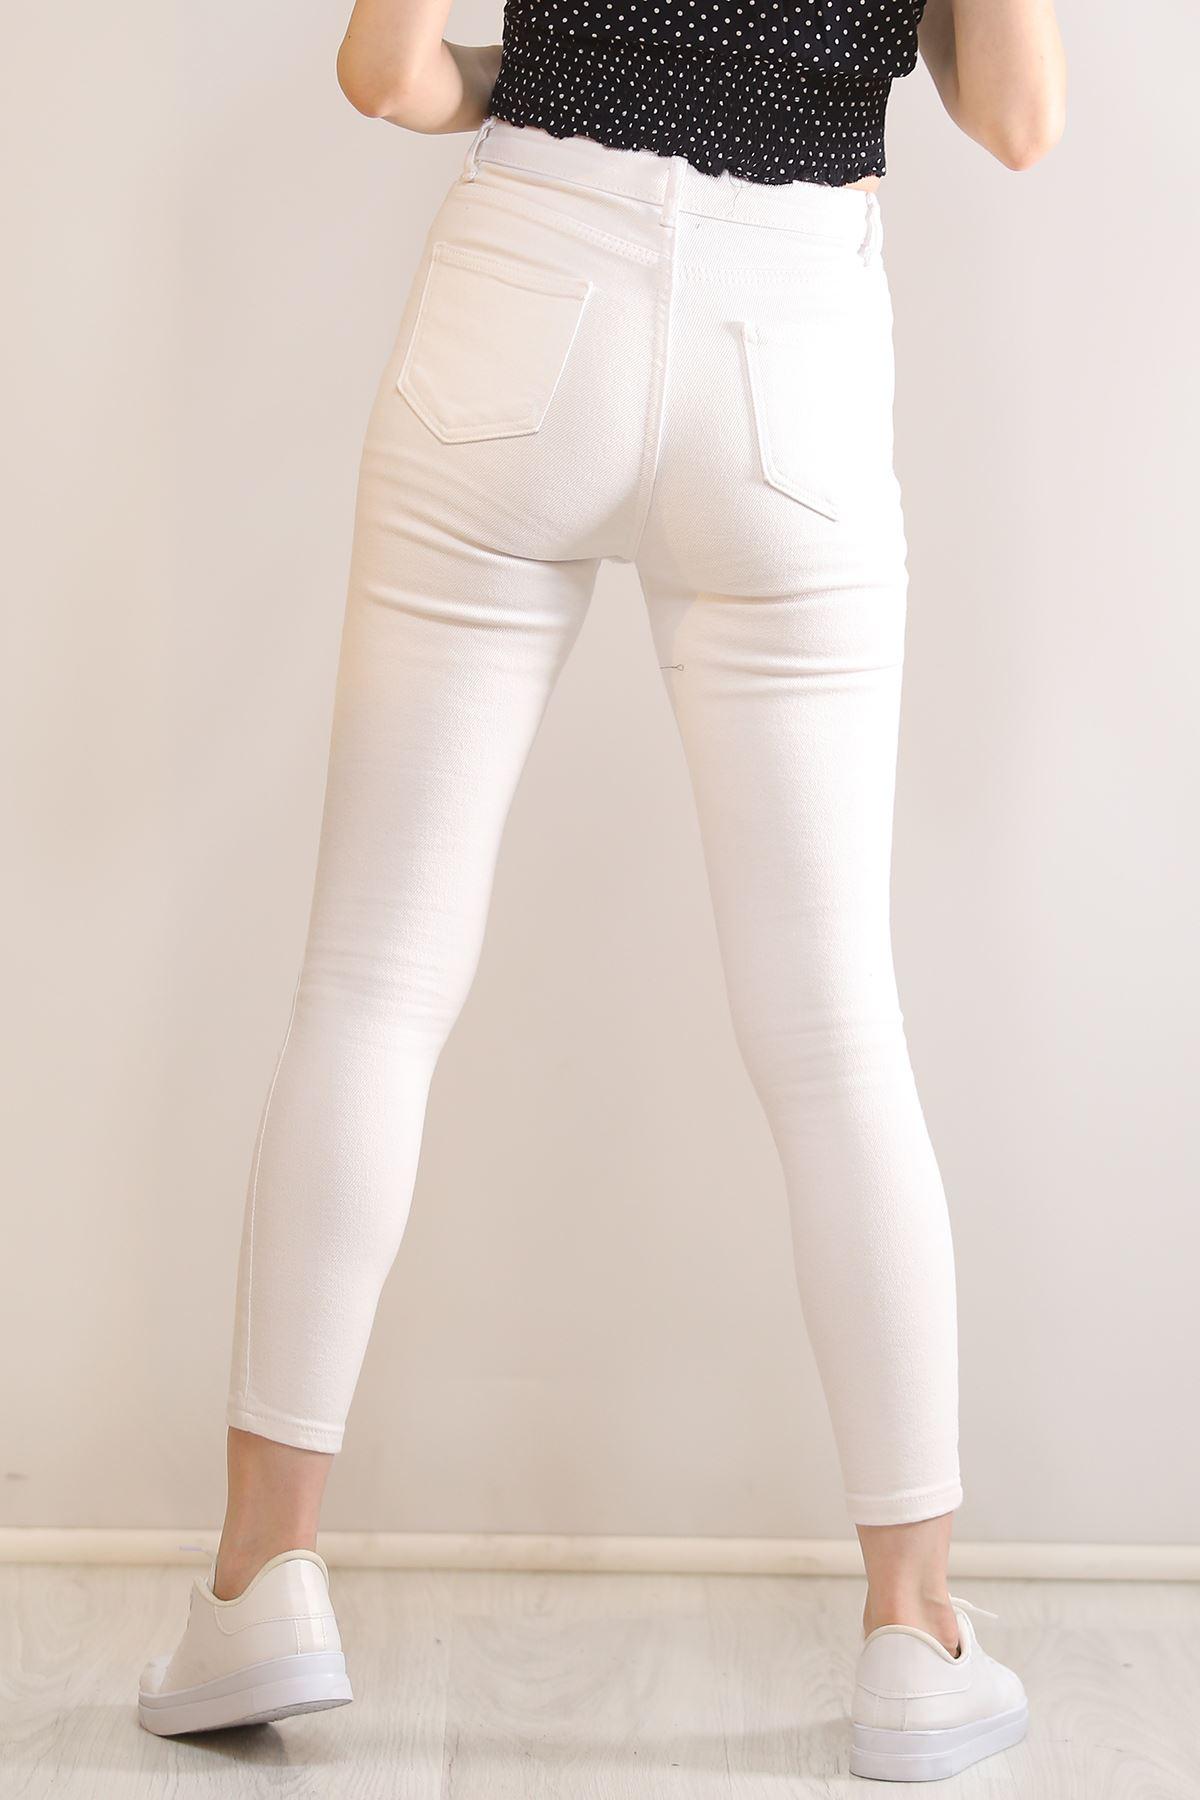 Dar Paça Kot Pantolon Beyaz - 5828.392.